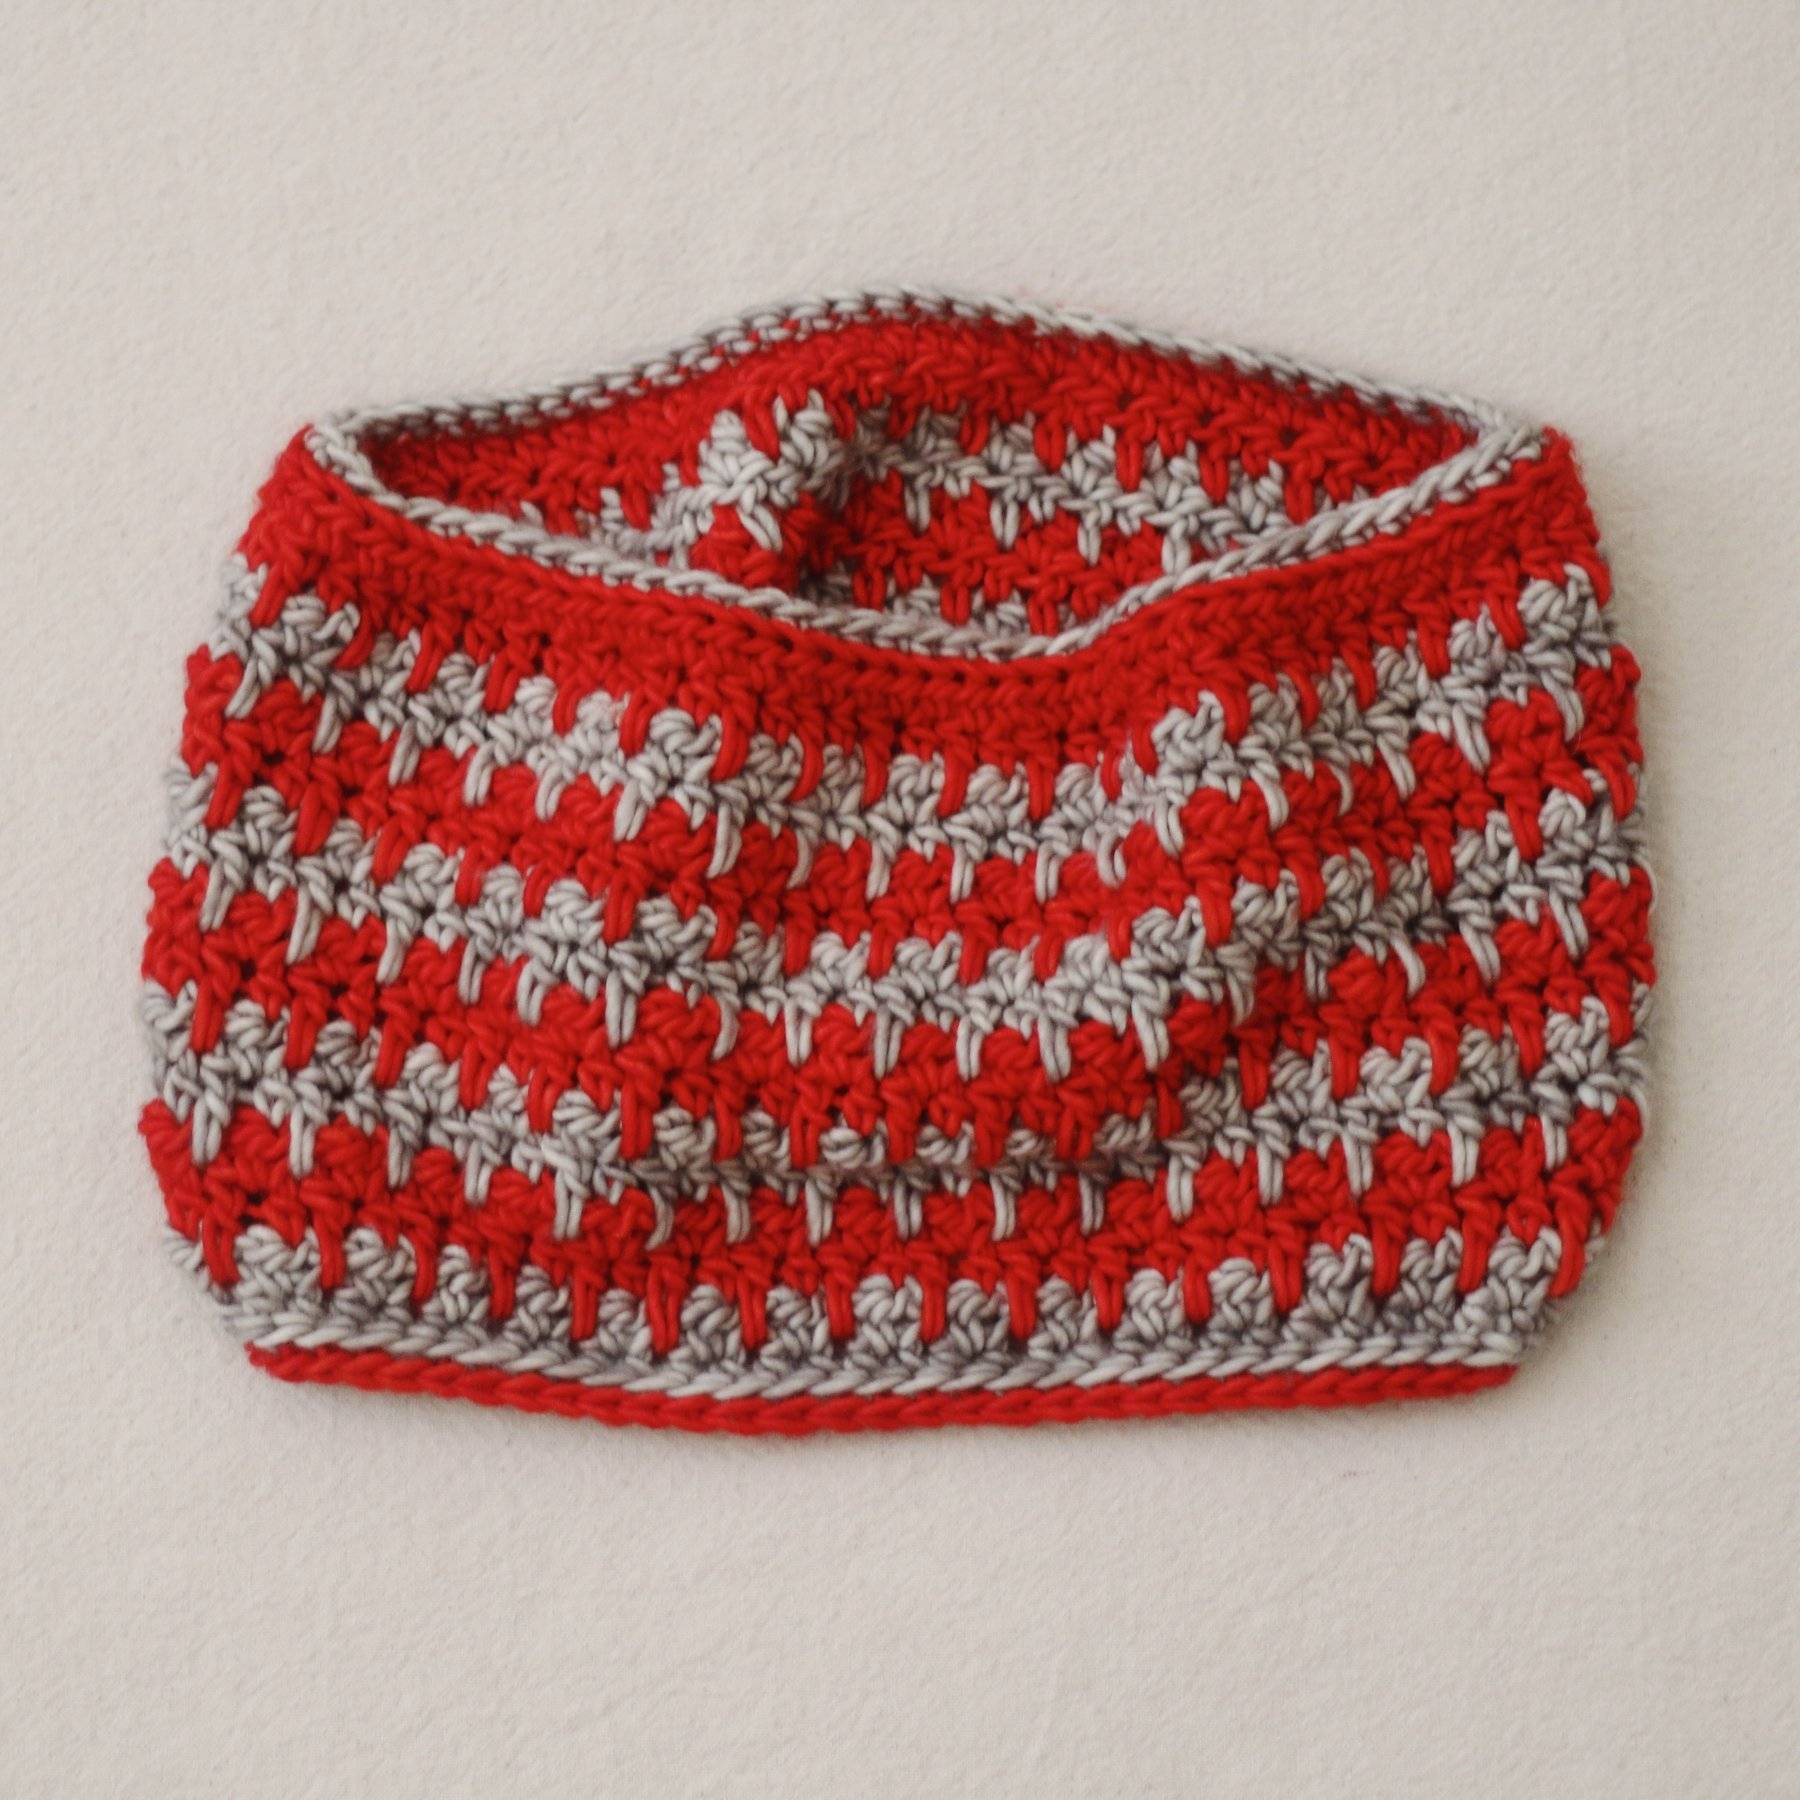 Candy Striper Crochet Cowl Kit